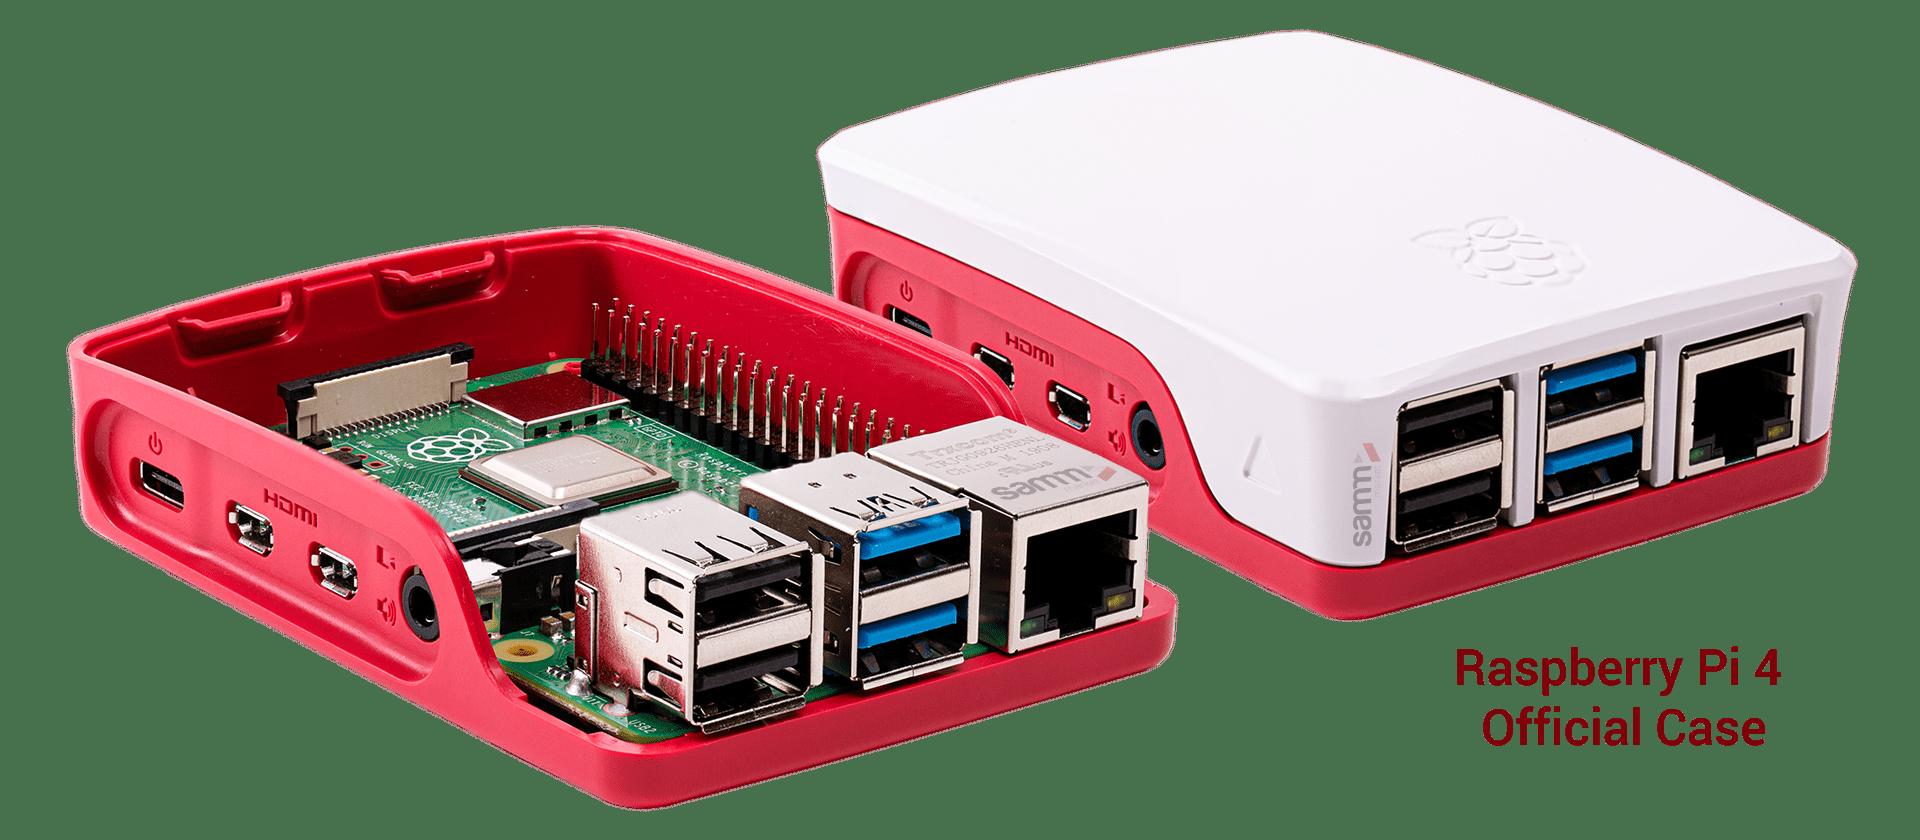 raspberry-pi-4-official-case